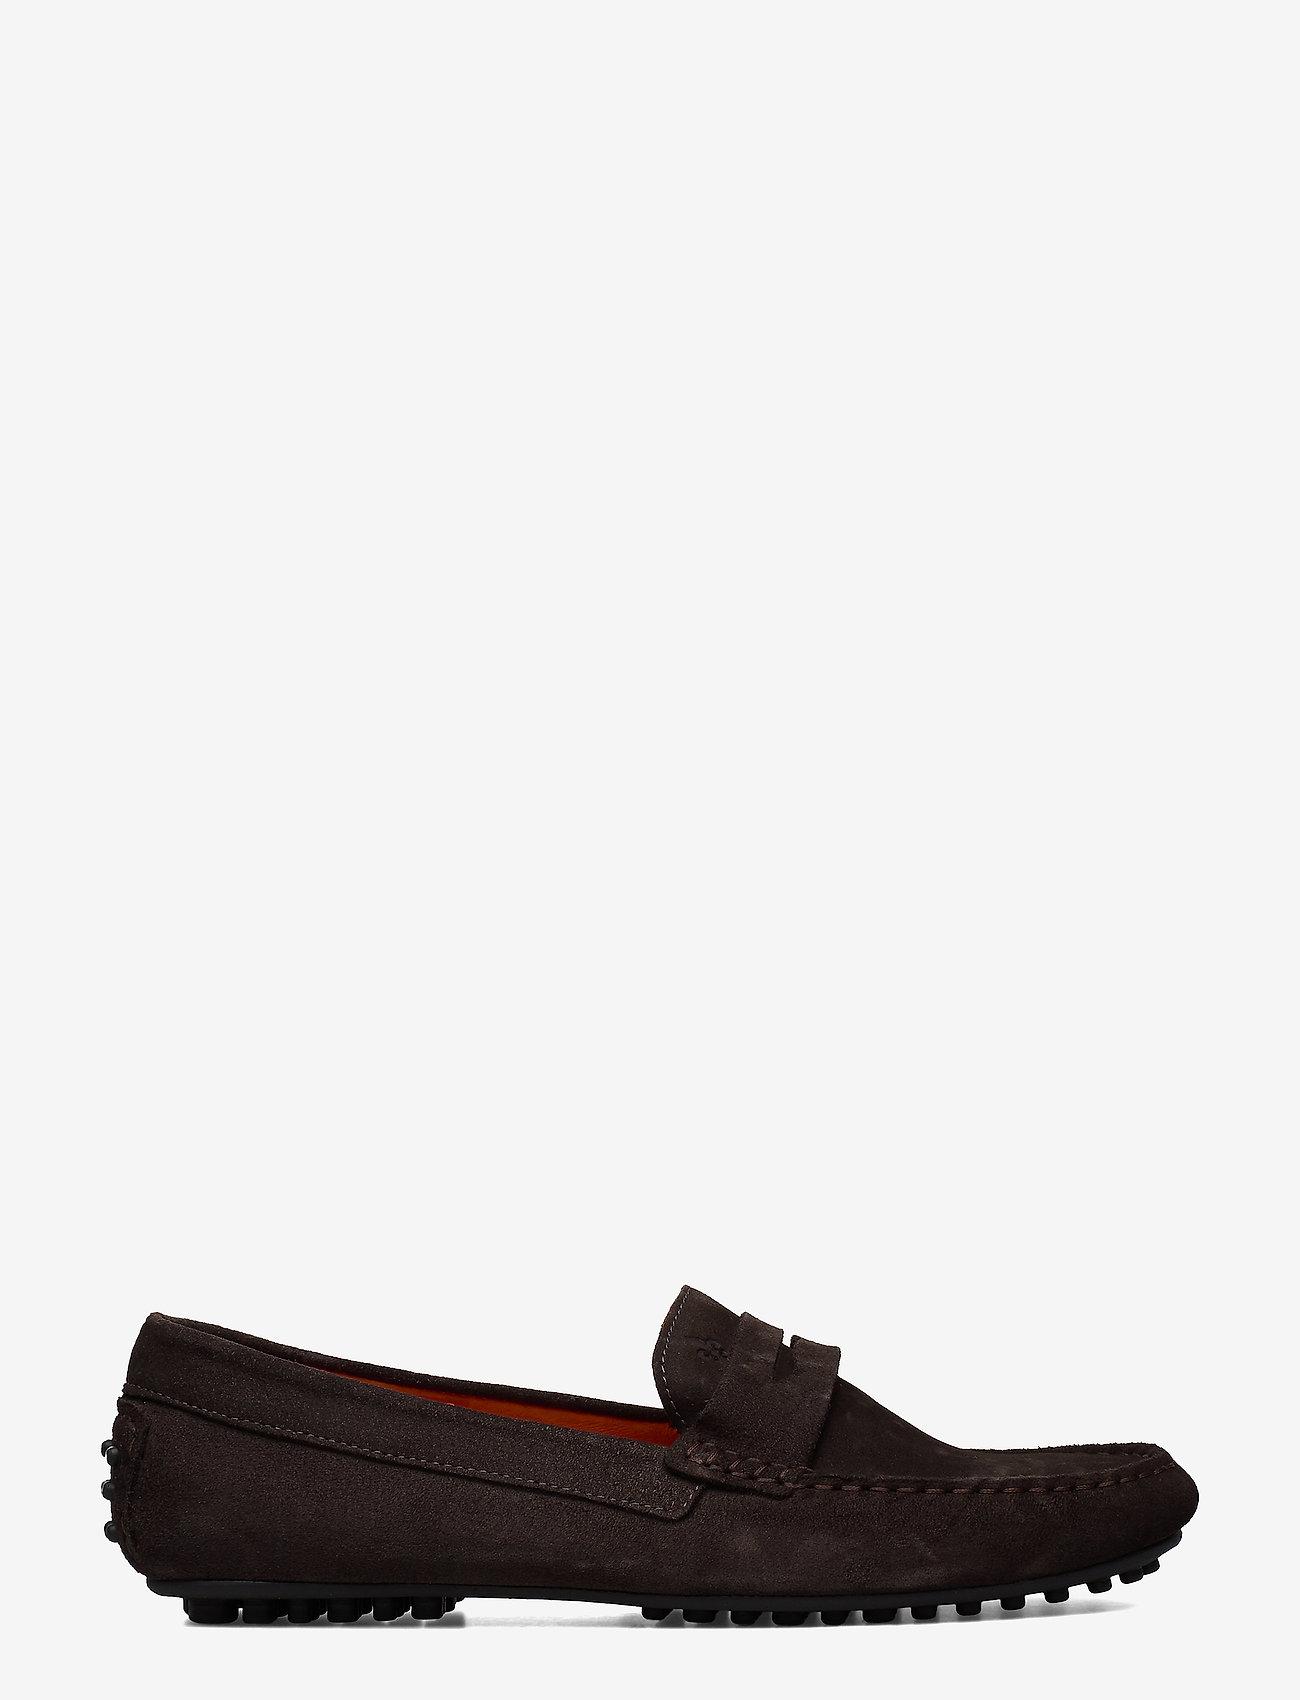 Morris - Agira Carshoe - loafers - brown - 1